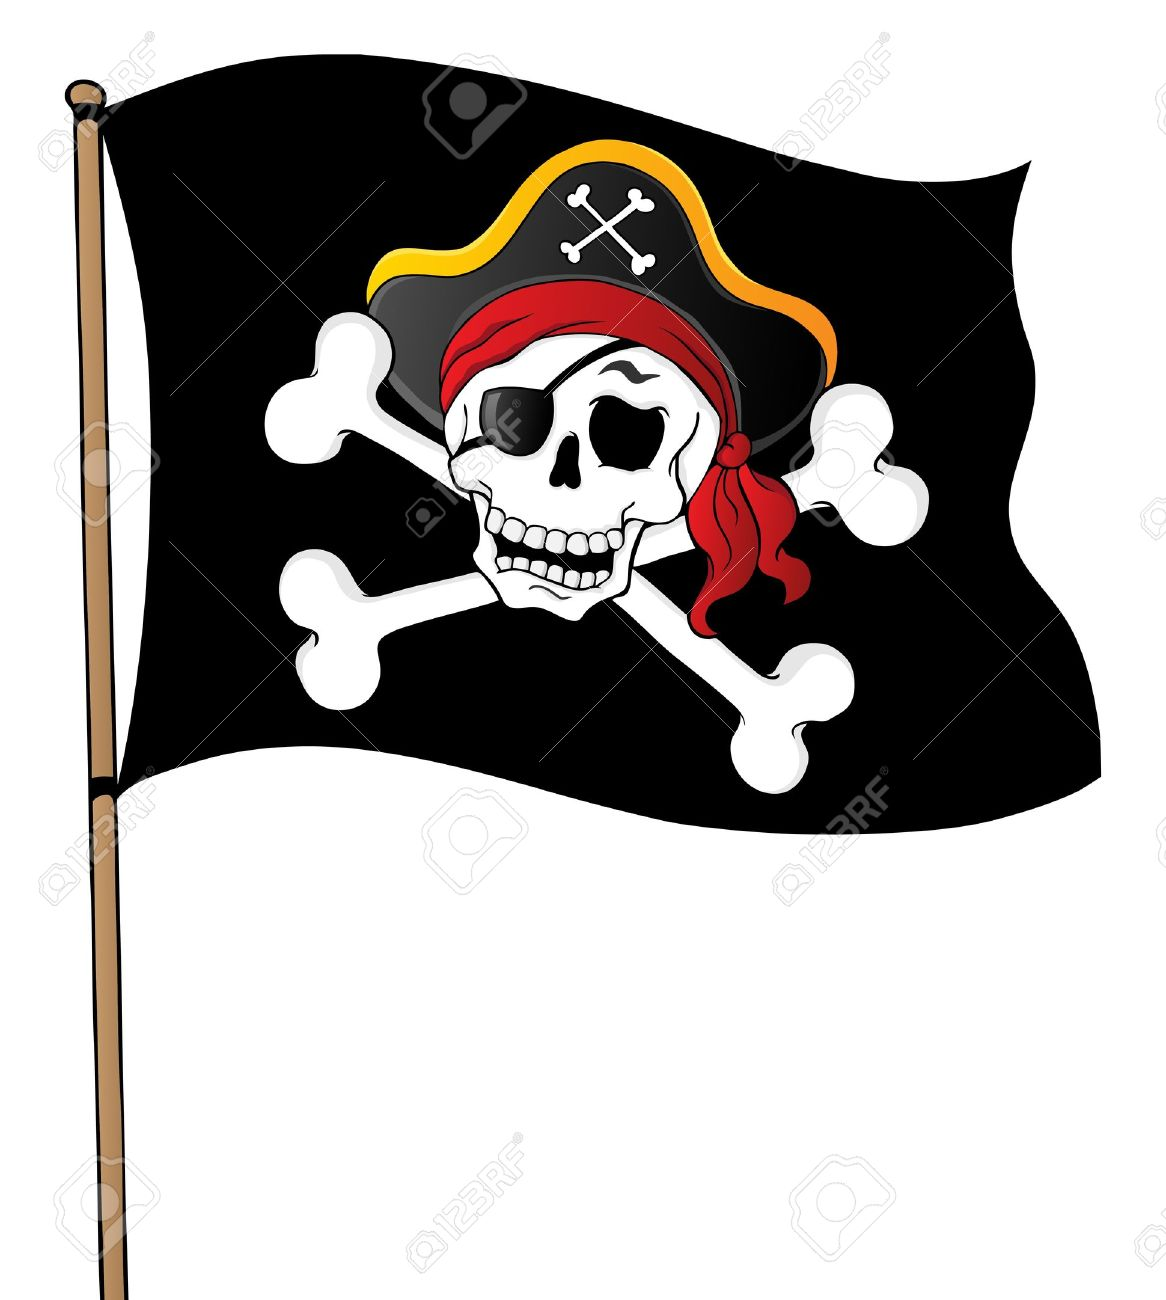 1166x1300 Pirate Flag Pirate Skull And Crossbones Clip Art